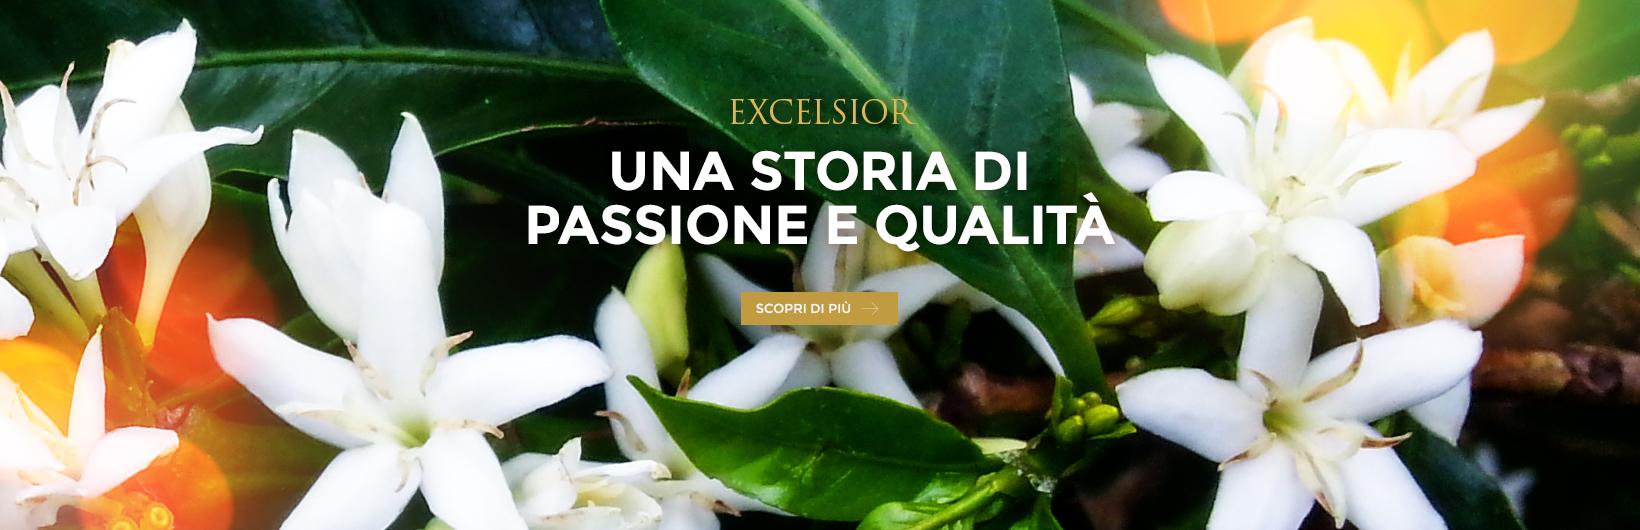 Banner_Piantagioni2